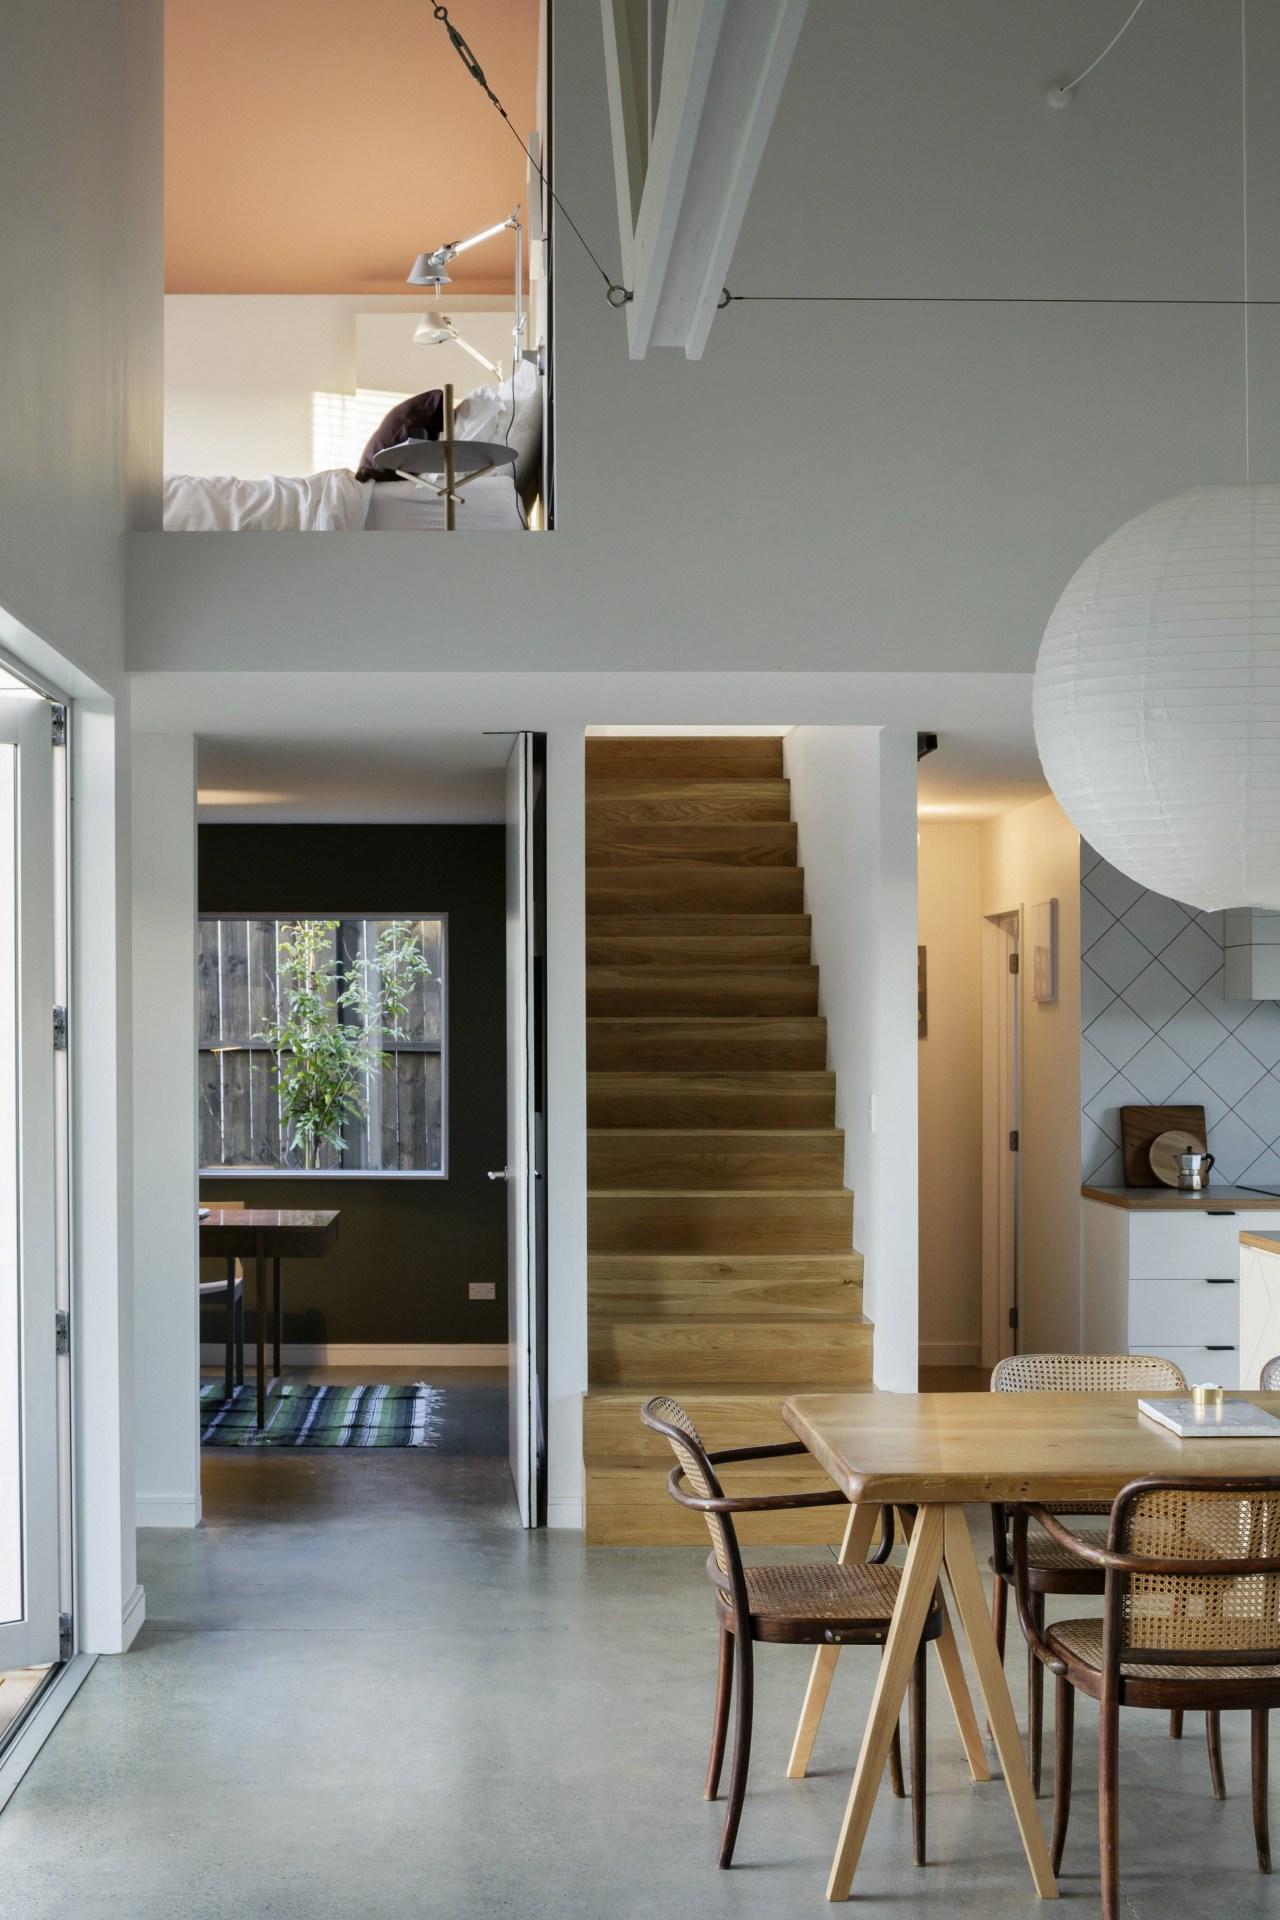 Resene Friar Grey and Resene Raptor feature on architecture, ceiling, daylighting, floor, flooring, hardwood, house, interior design, laminate flooring, wood, wood flooring, gray